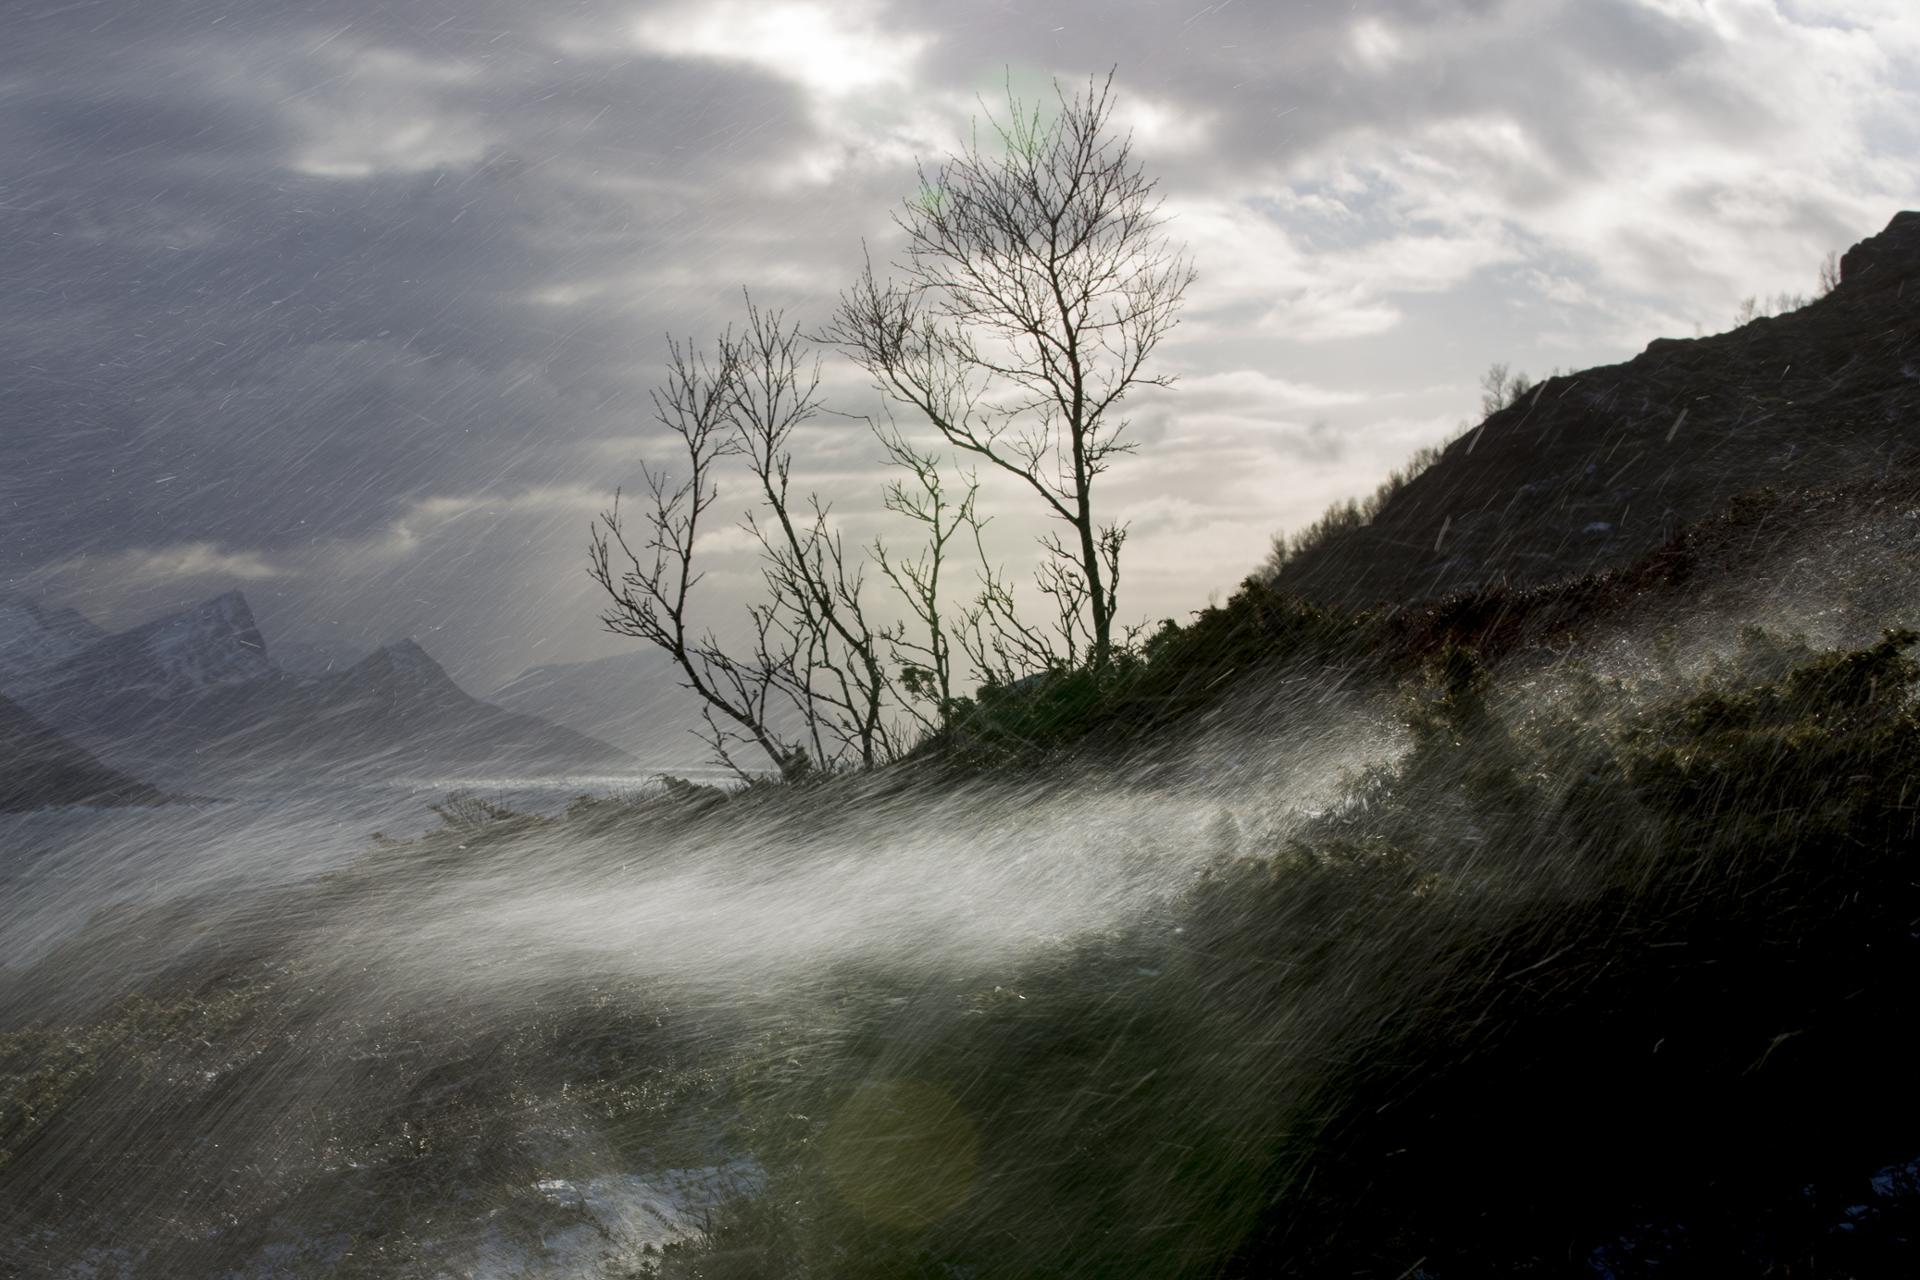 tempête aux lofoten